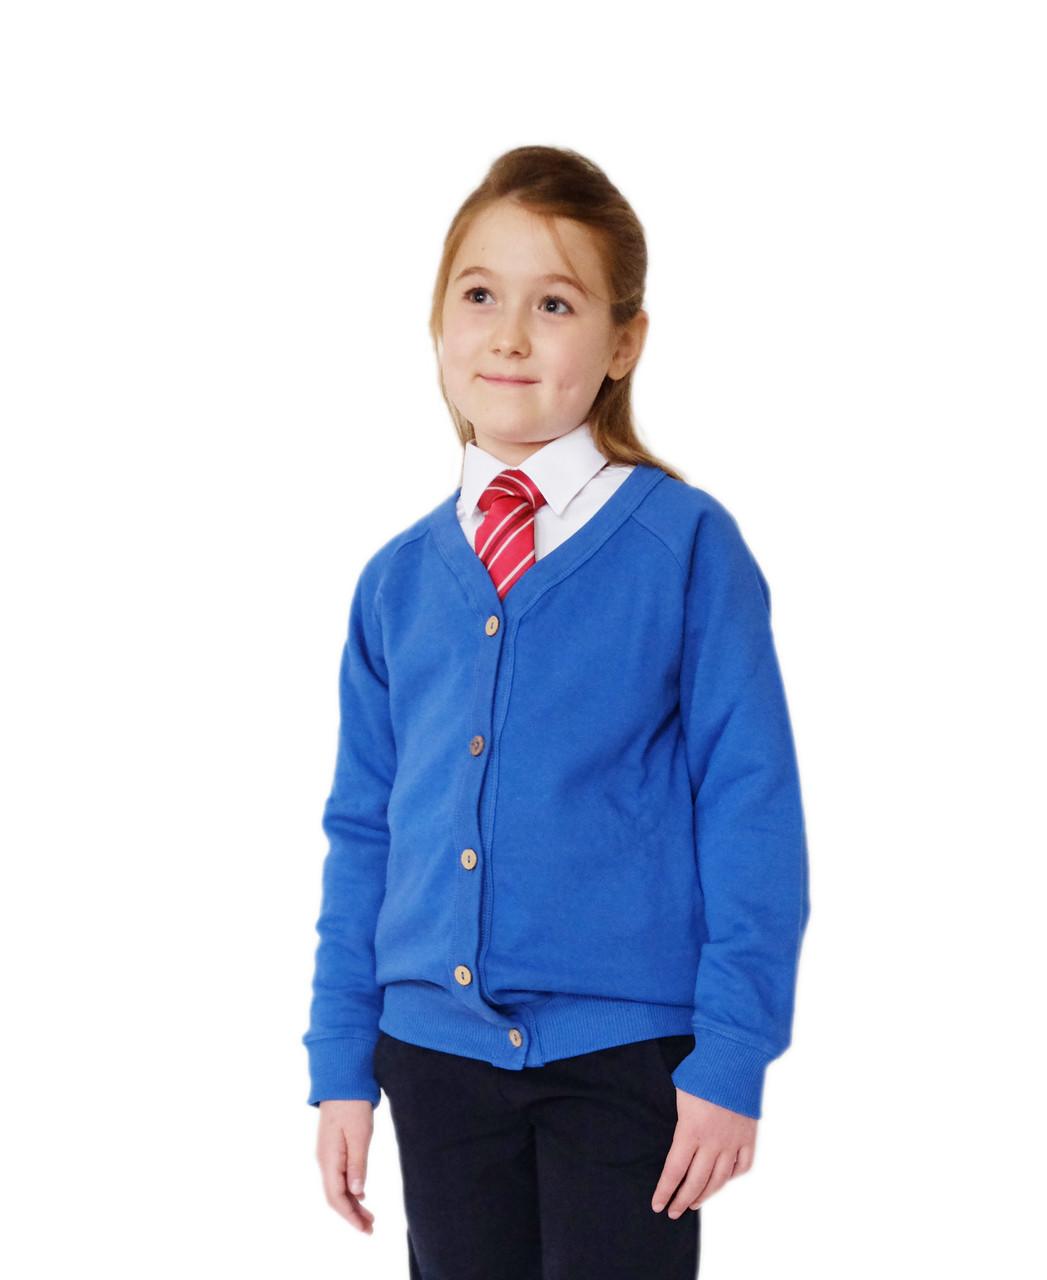 Organic Cotton School Cardigan - Royal Blue